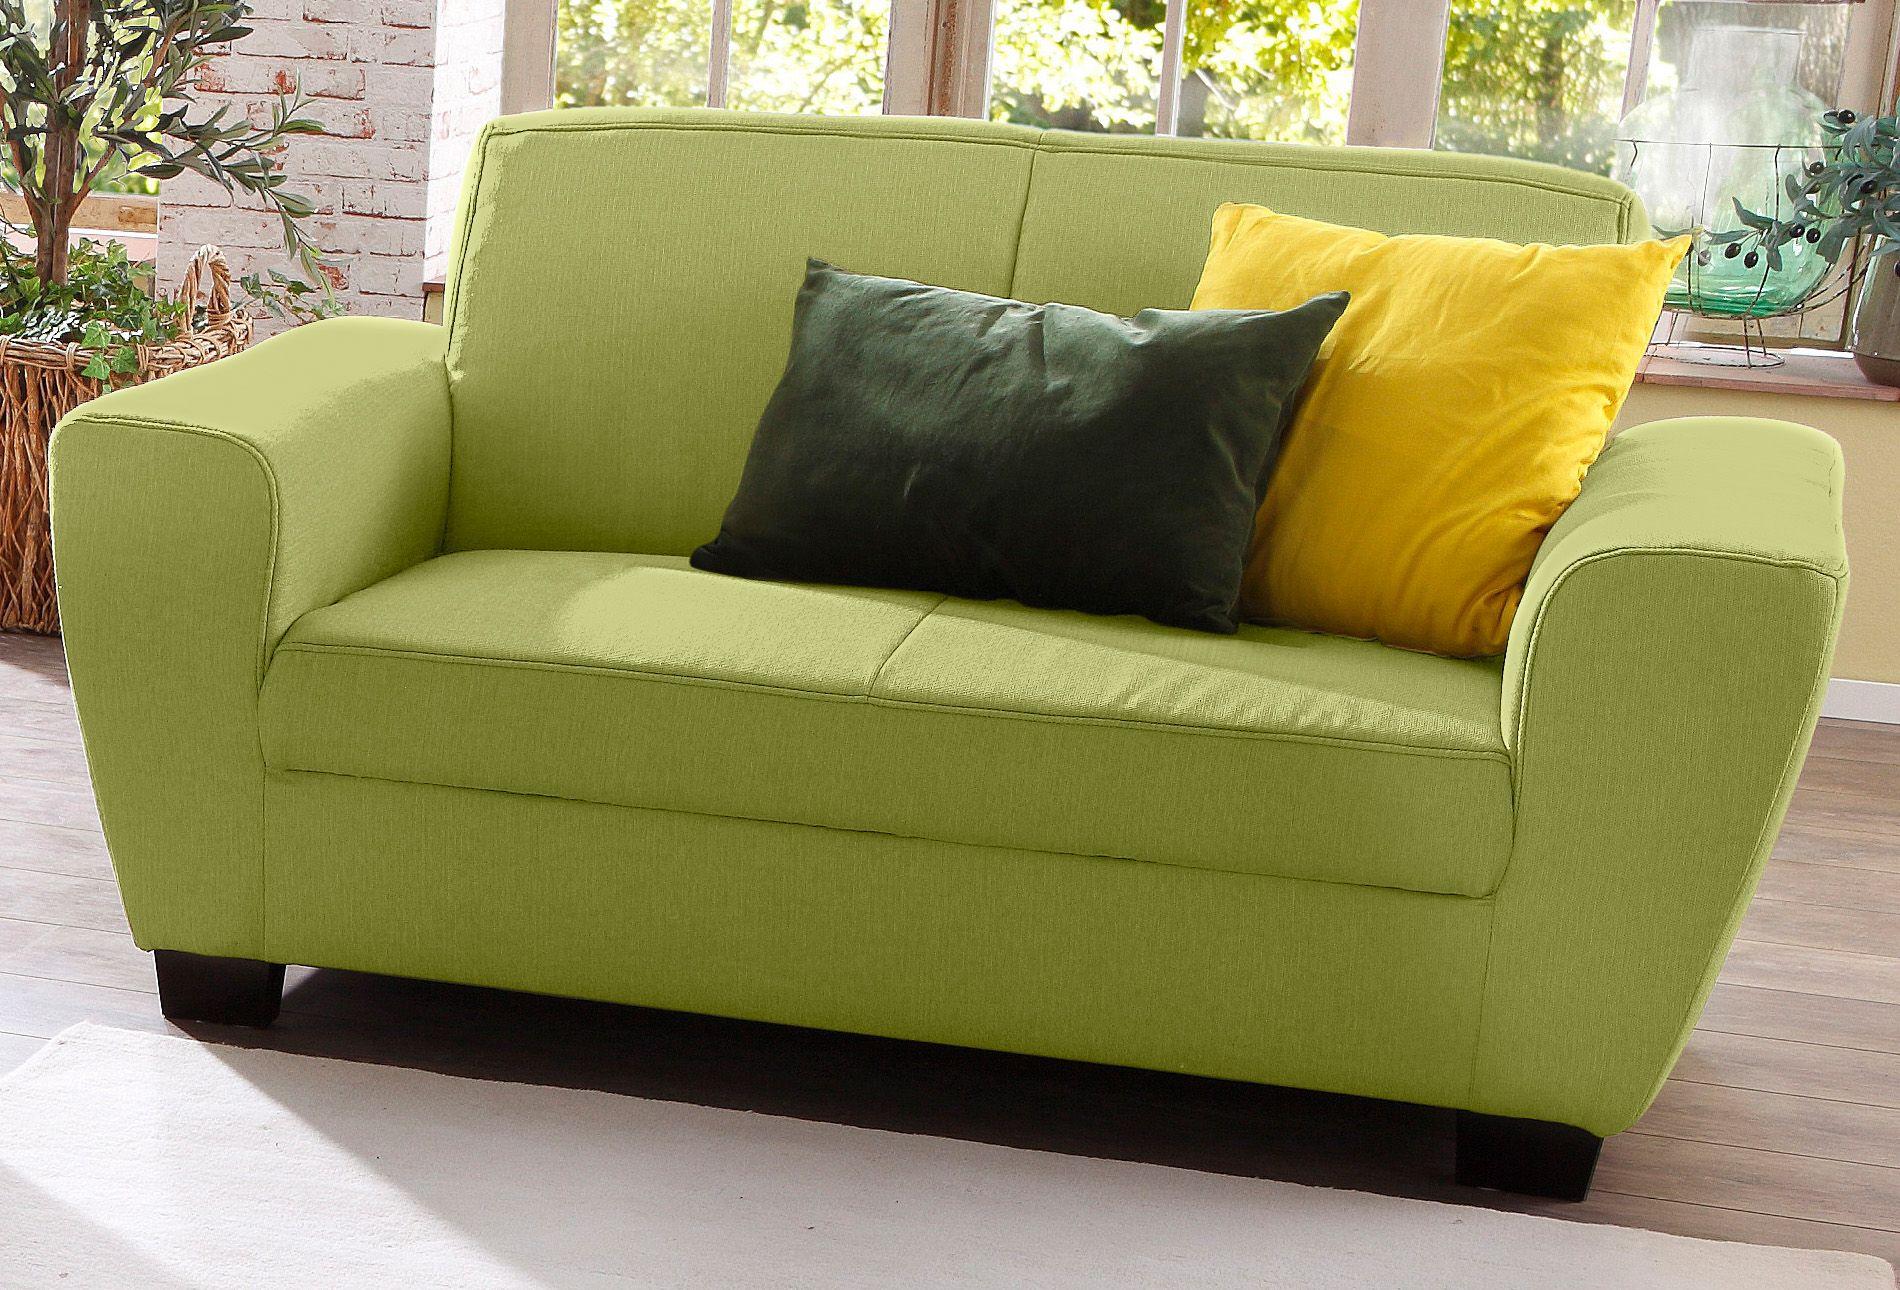 home affaire sofa ranger mit federkern schwab versand. Black Bedroom Furniture Sets. Home Design Ideas